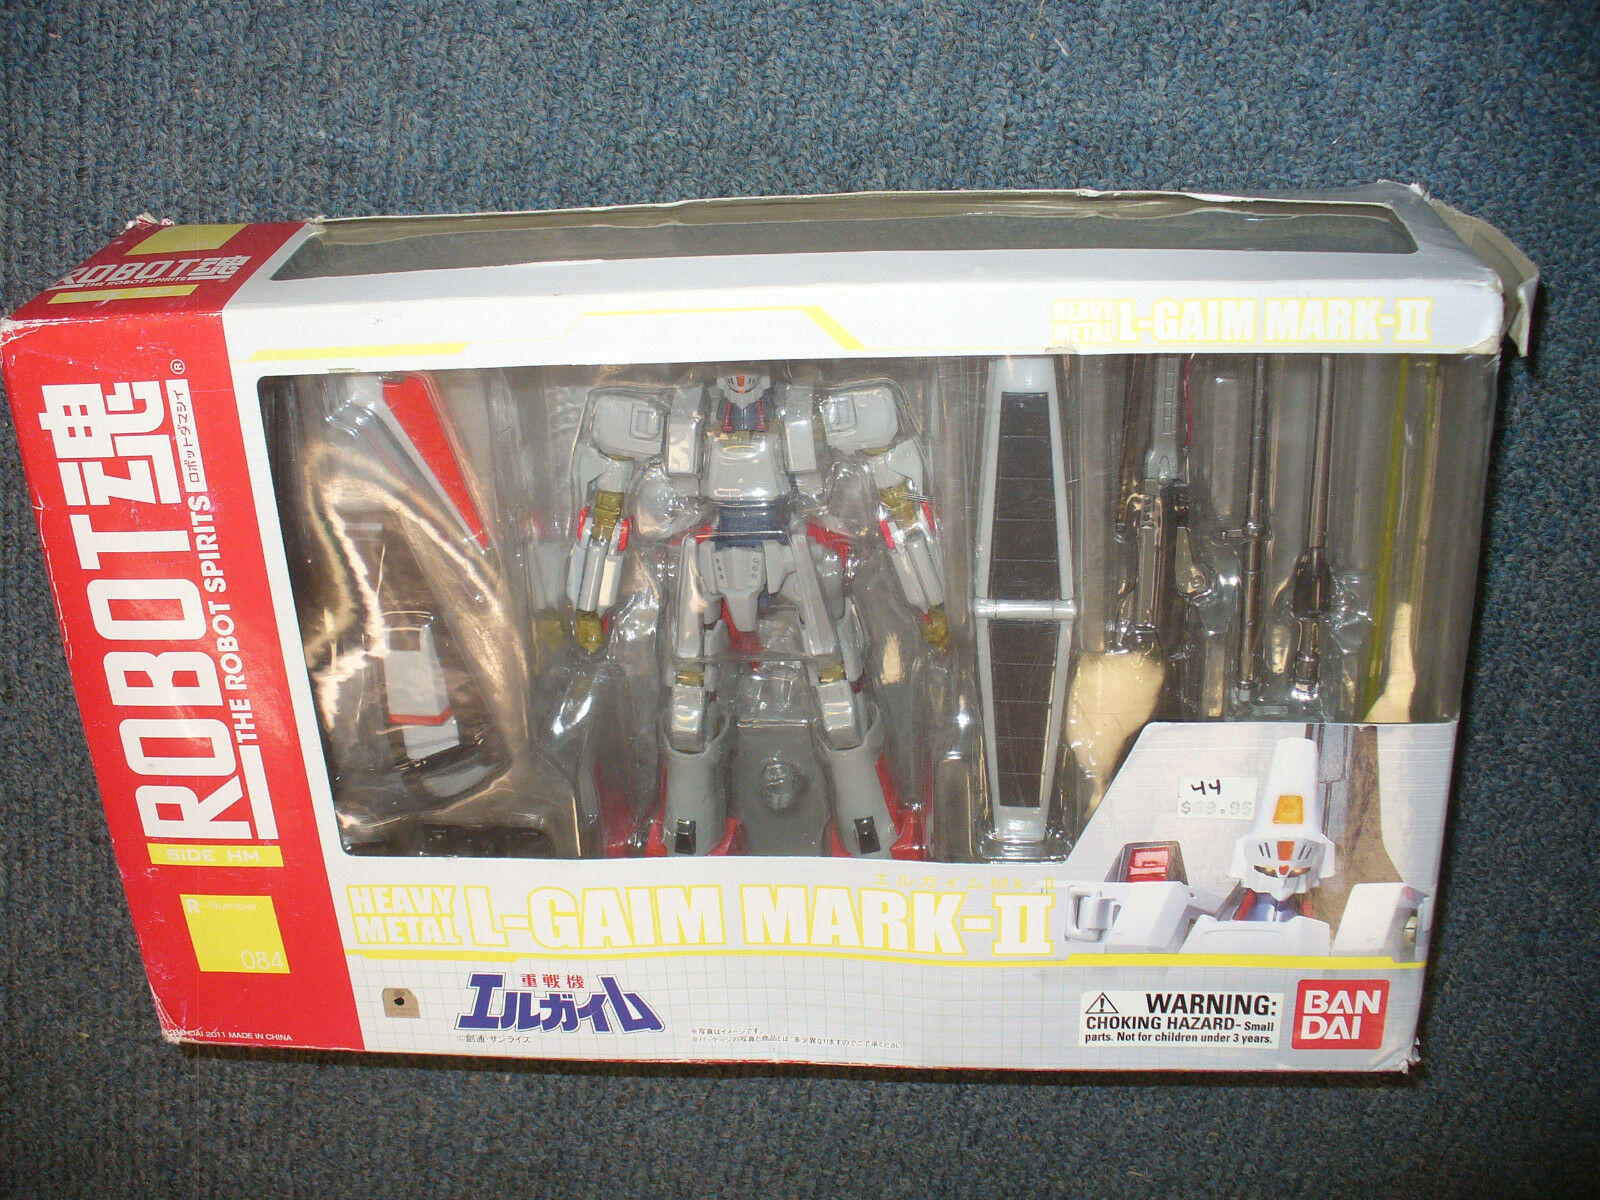 Bandai The Robot Robot Robot Spirits Heavy Metal L Gaim Mark II R Number 084 dae6e4